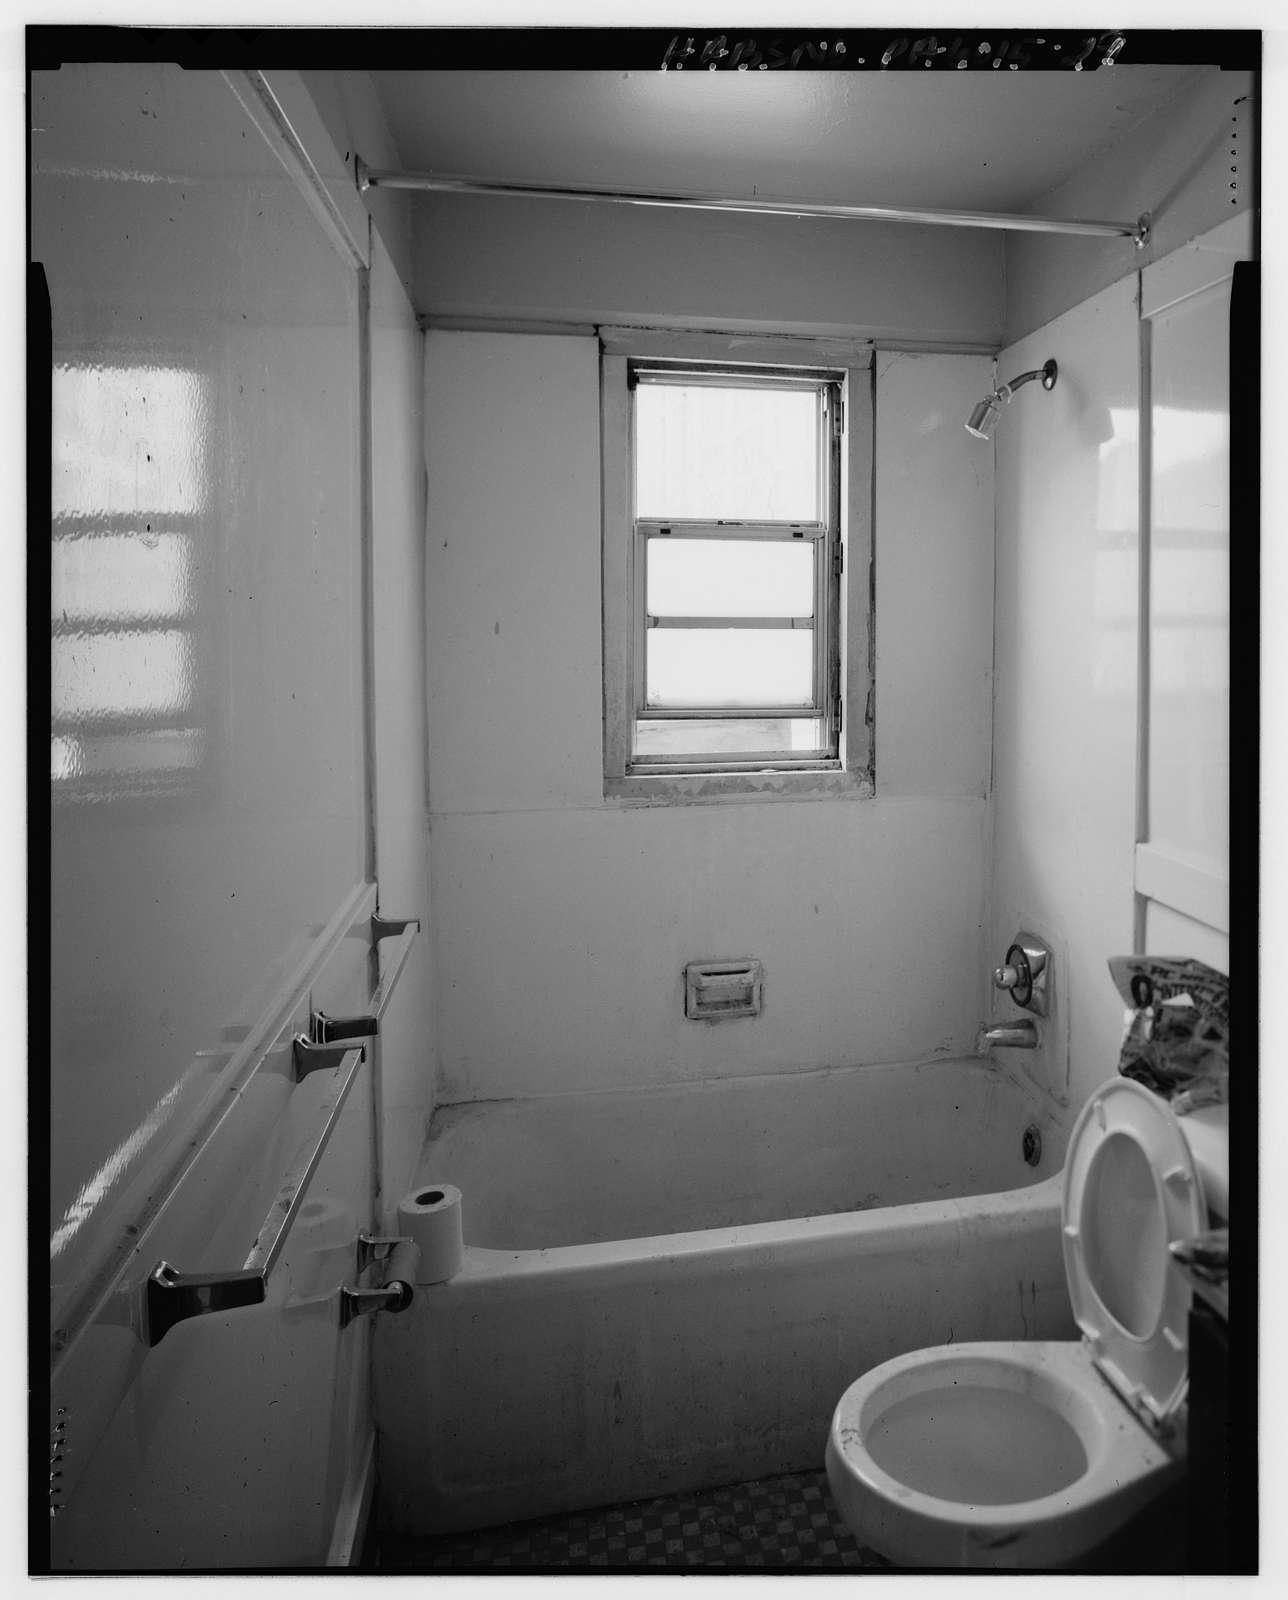 Richard Allen Homes, Bounded by Poplar & Ninth Streets, Fairmount Avenue & Twelfth Street, Philadelphia, Philadelphia County, PA